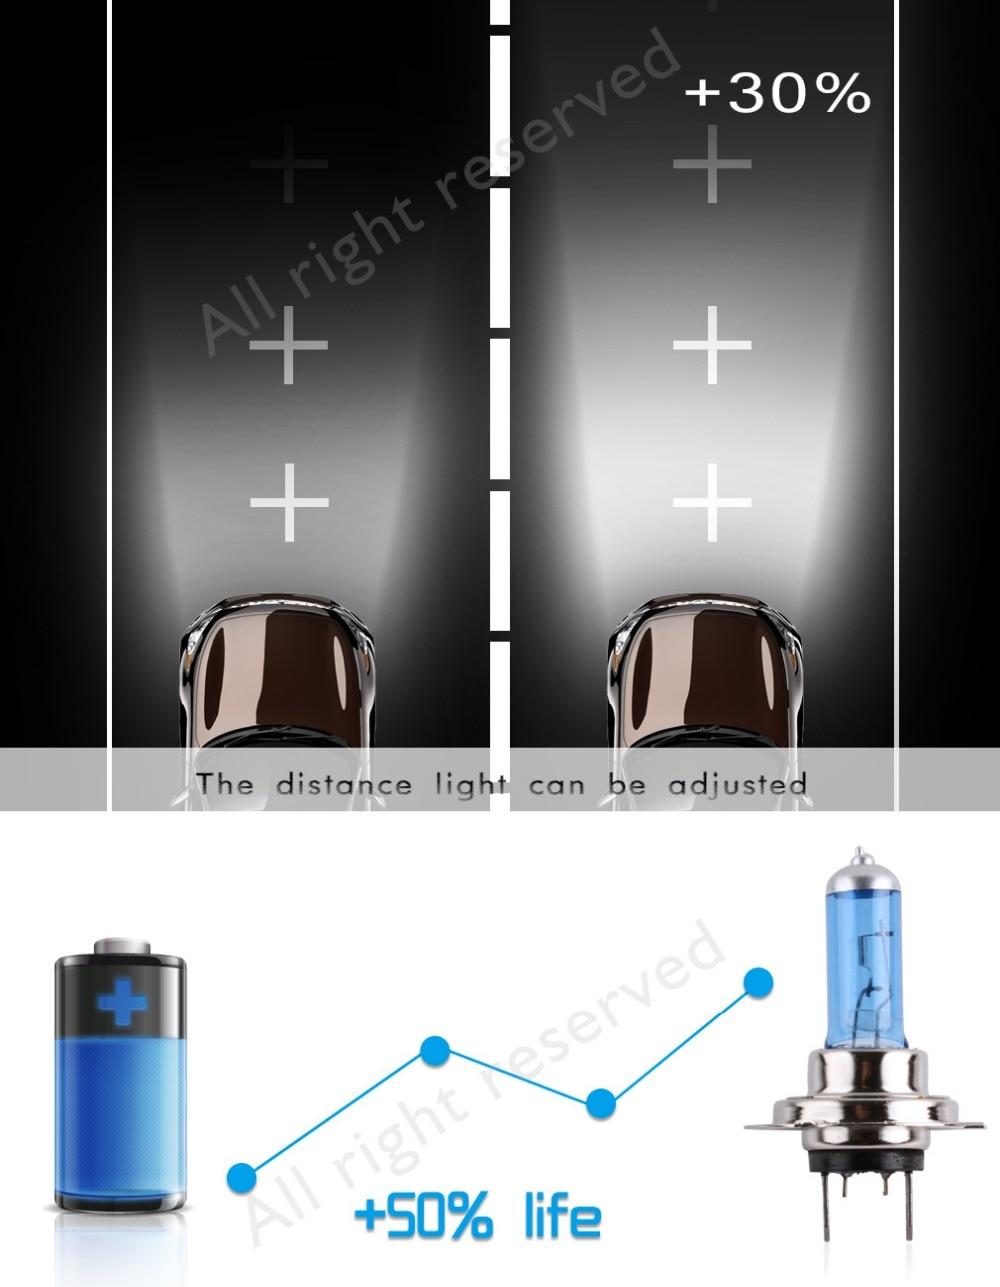 2pcs H7 100W 12V 55W Super Bright White Fog Lights Halogen Bulb High Power Car Headlights Lamp Car Light Source parking 5